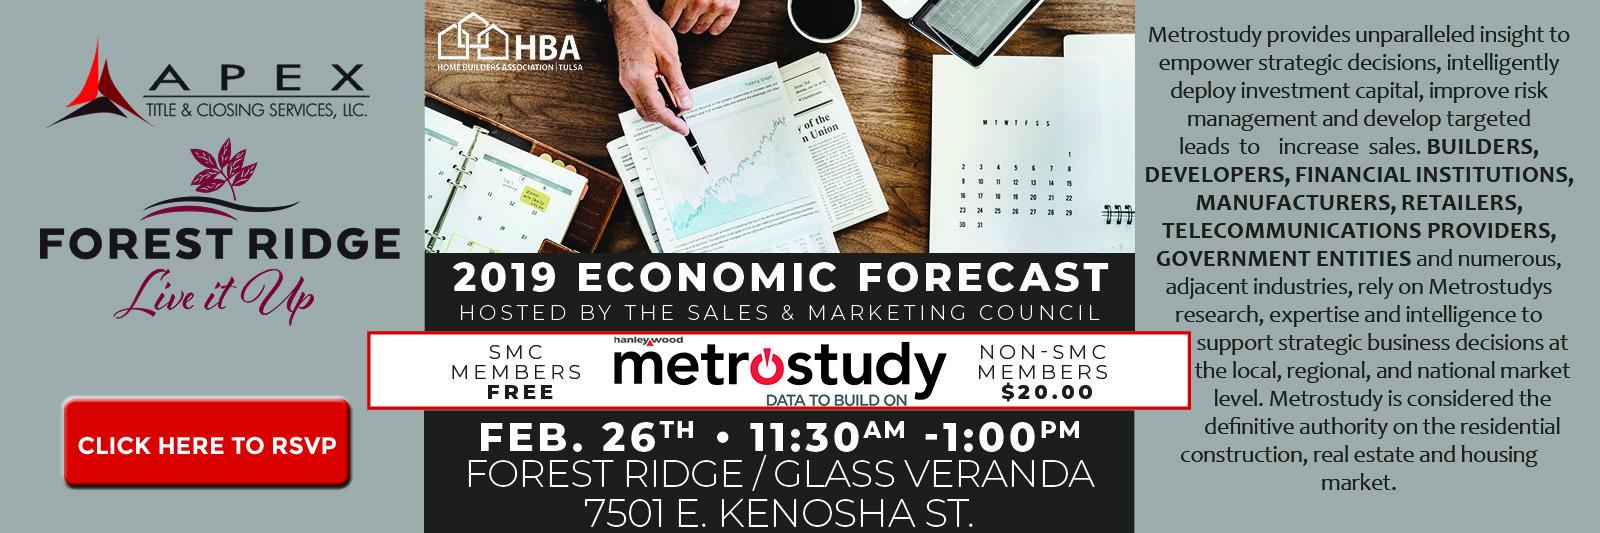 SMC_EconomicForecast_WebBanner2019.jpg